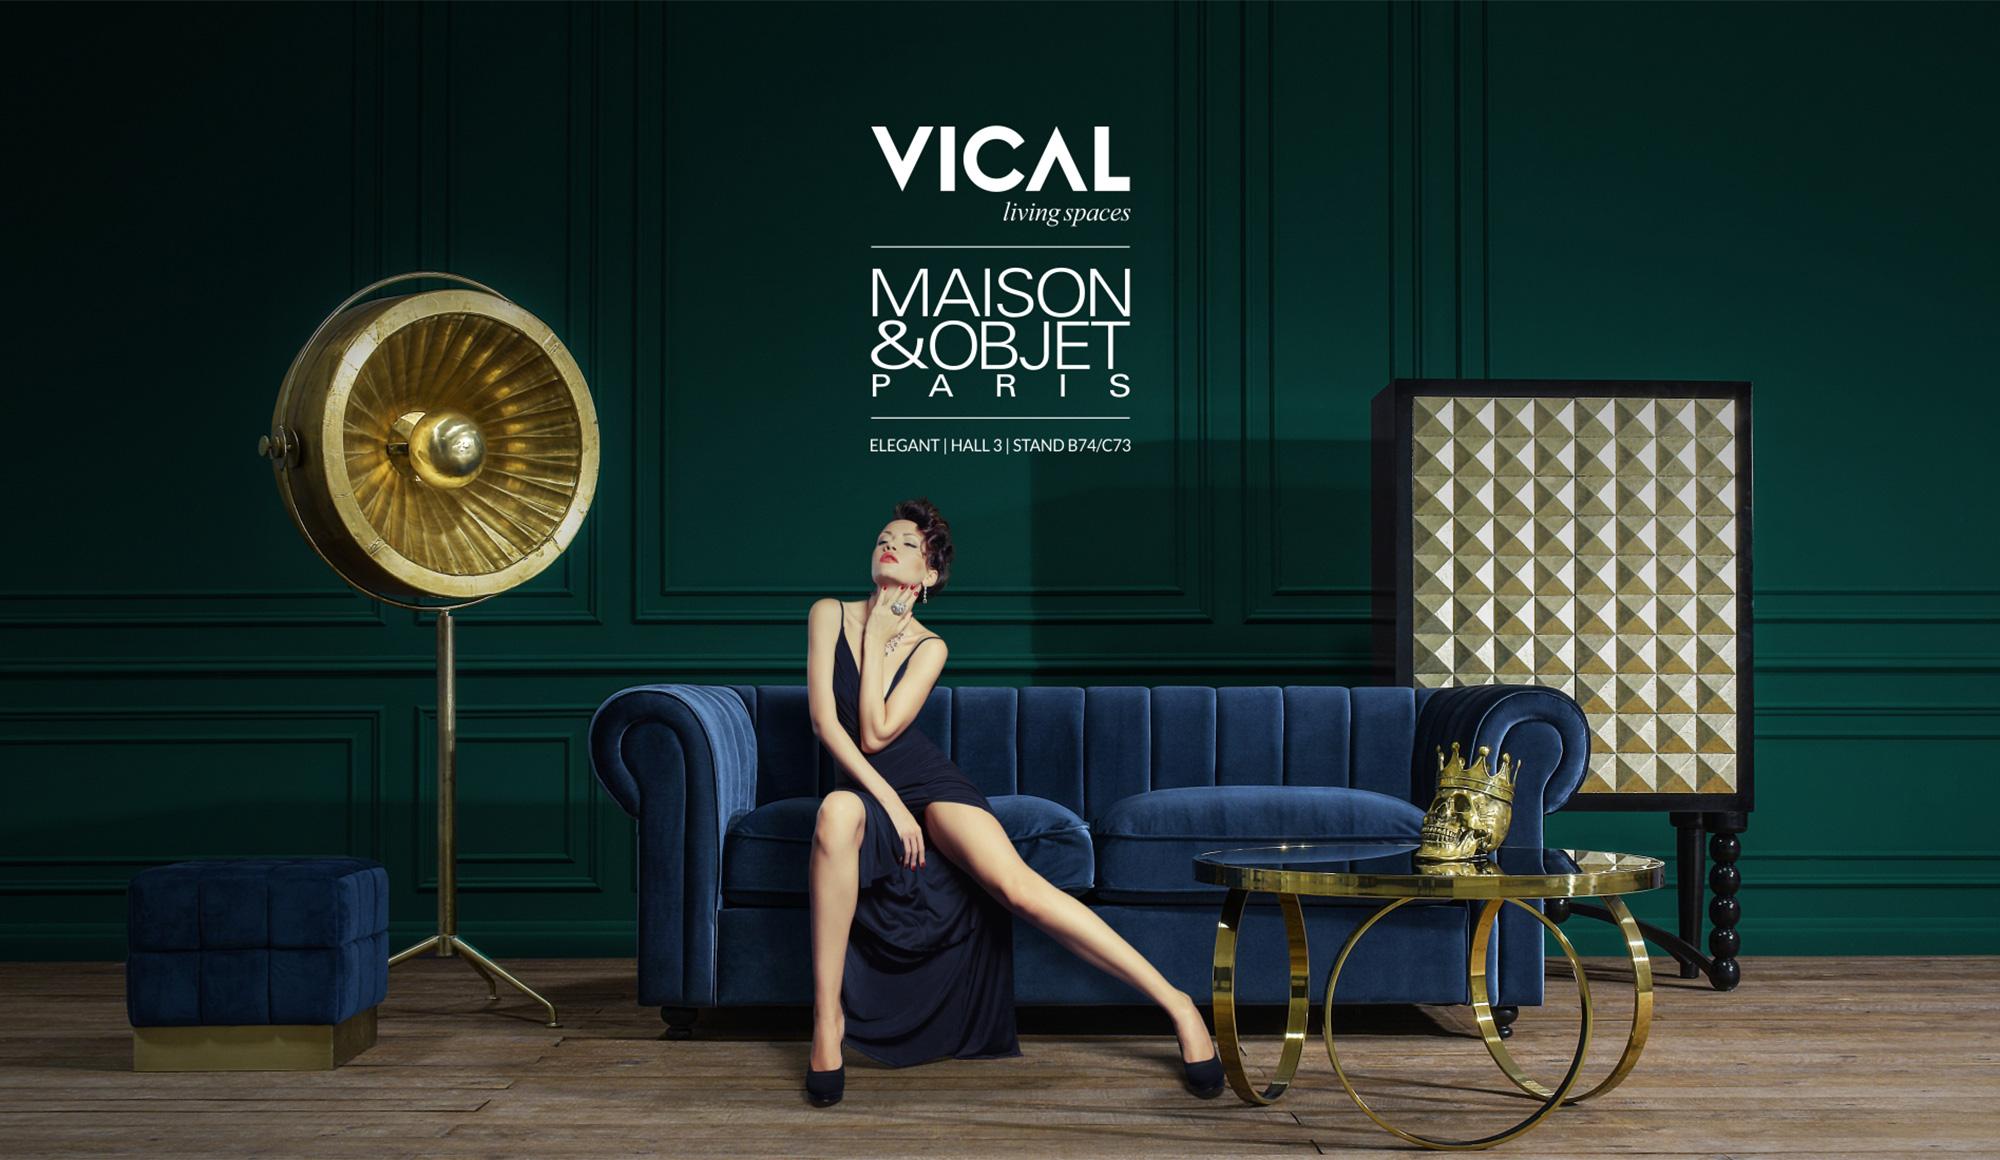 cataleg-vical-©pepgramage2018